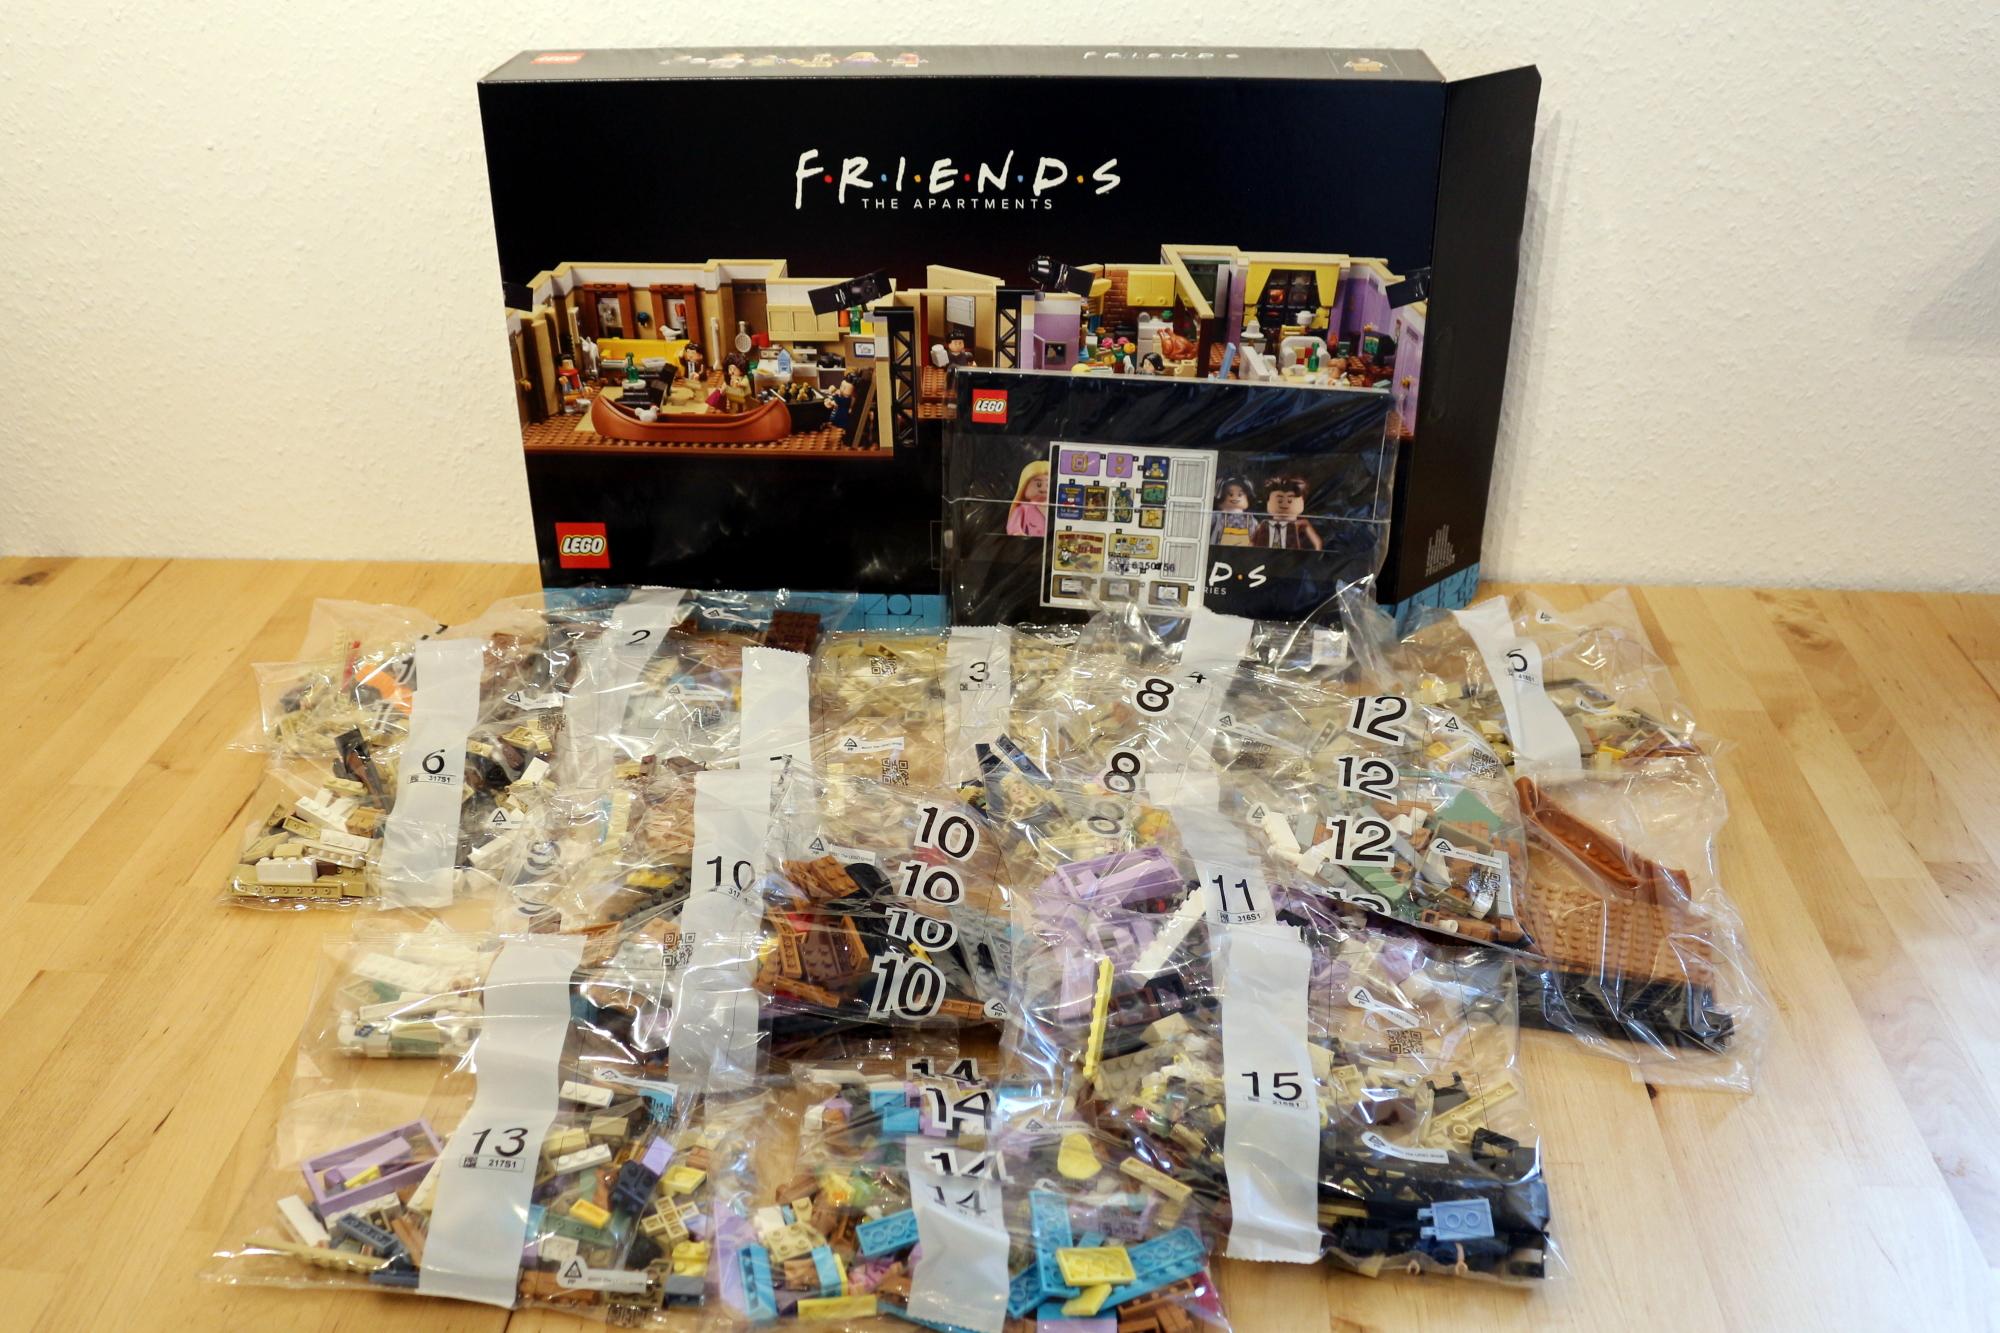 LEGO Friends 10292 The Friends Apartments 6